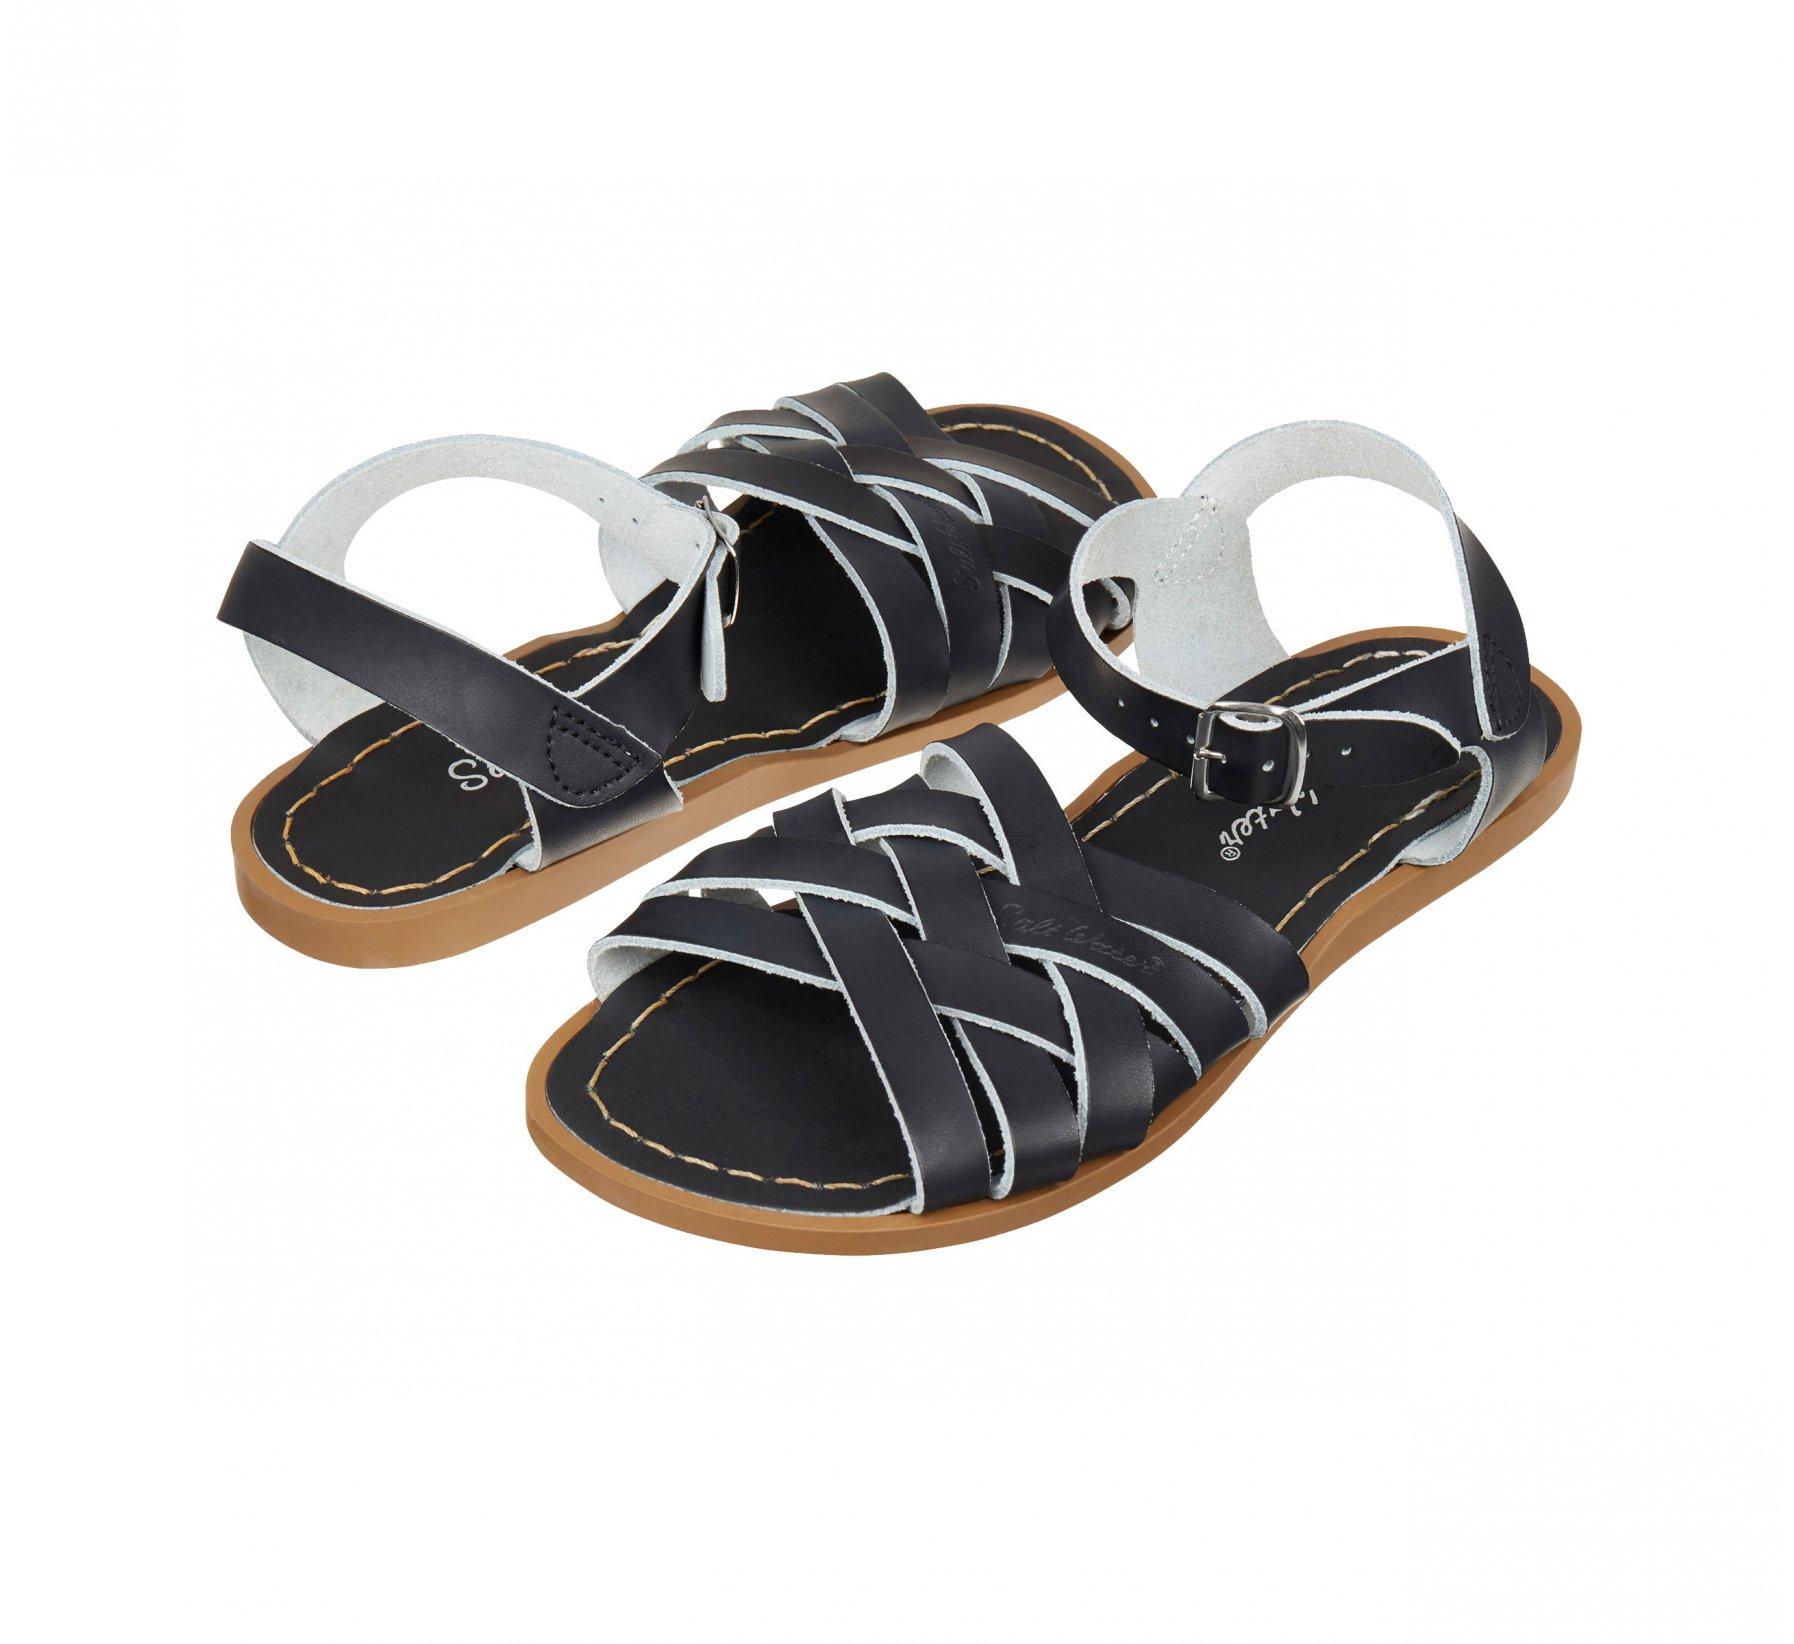 Retro Bleu Marine - Salt Water Sandals